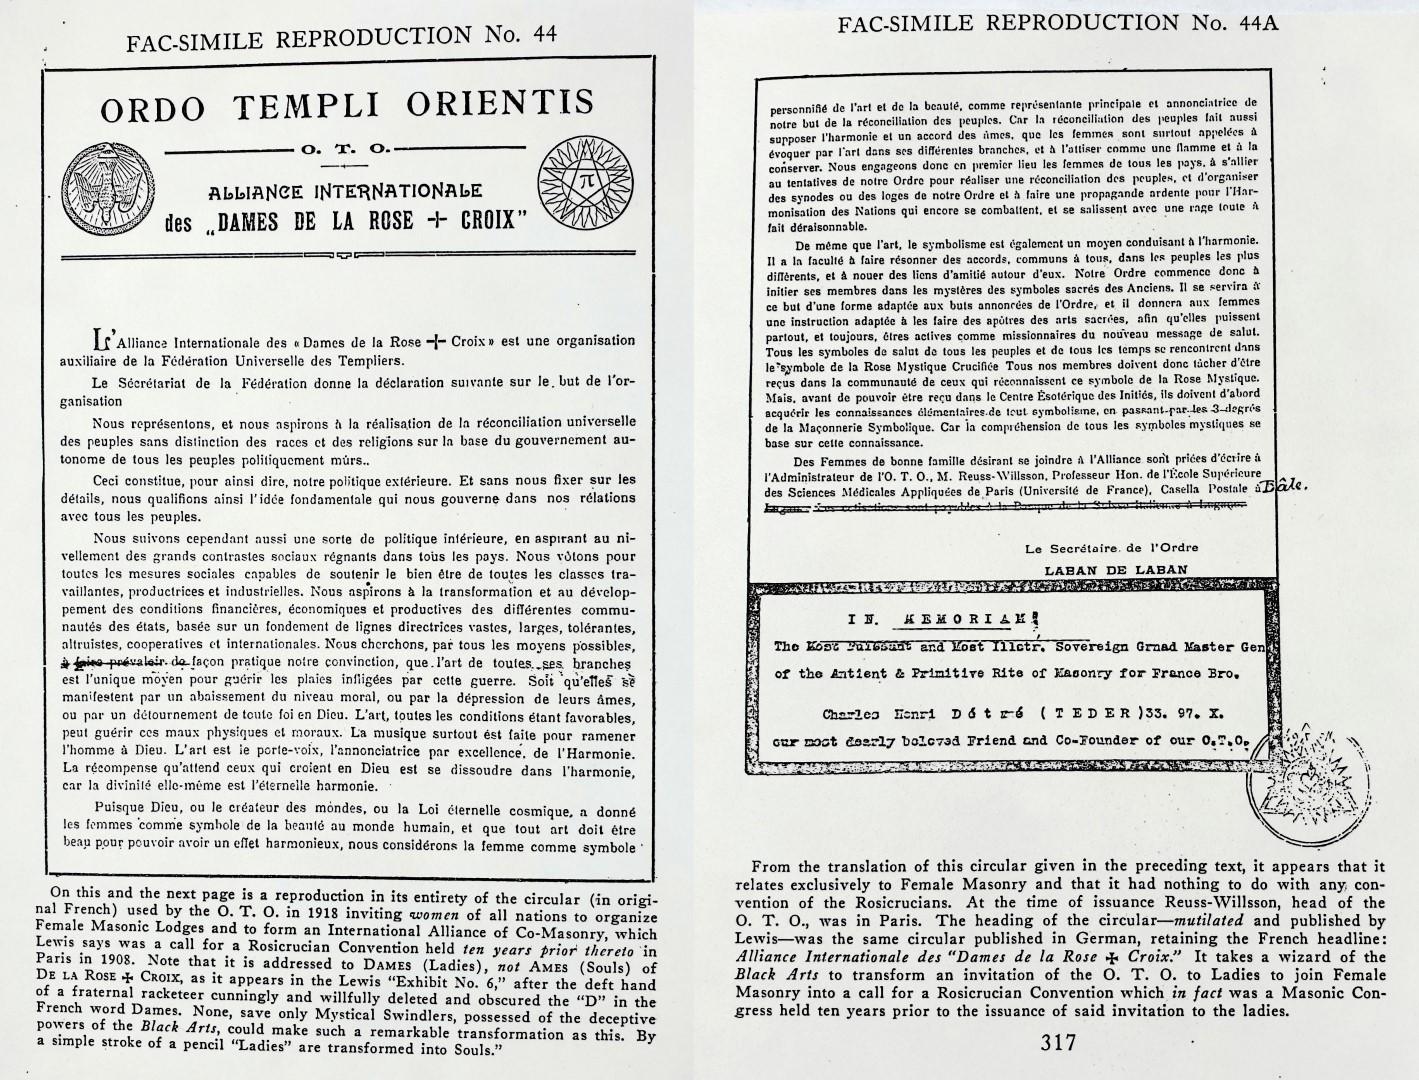 Laban de Laban, Ordo Templi Orientis, International Meeting of the Dames de la Rose+Croix